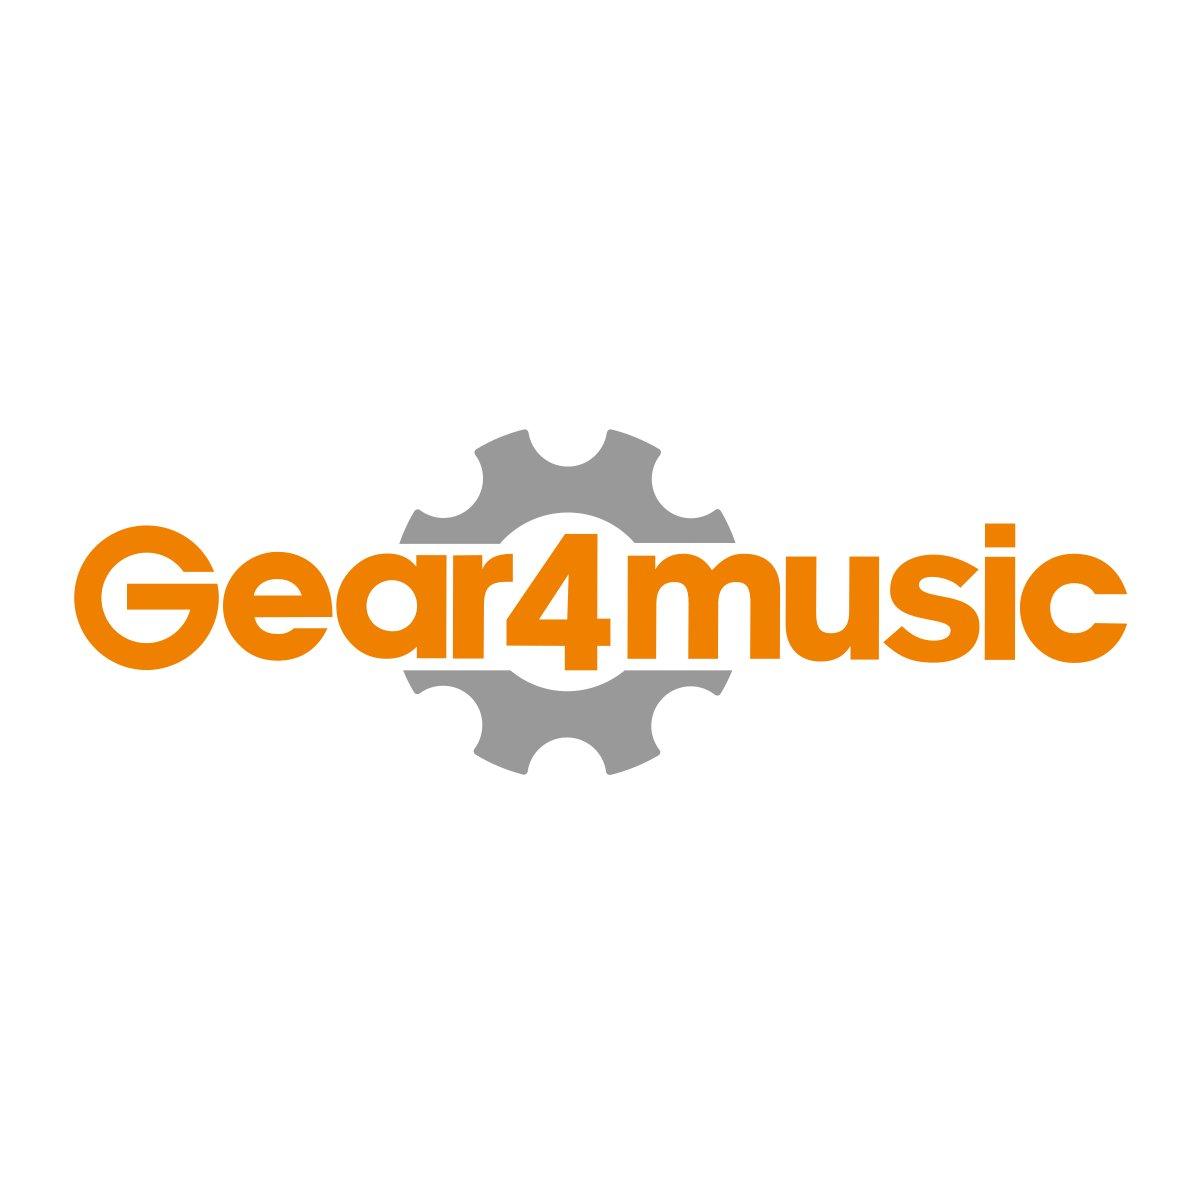 Pearl 795RE Elegante Flute, Open Hole at Gear4music